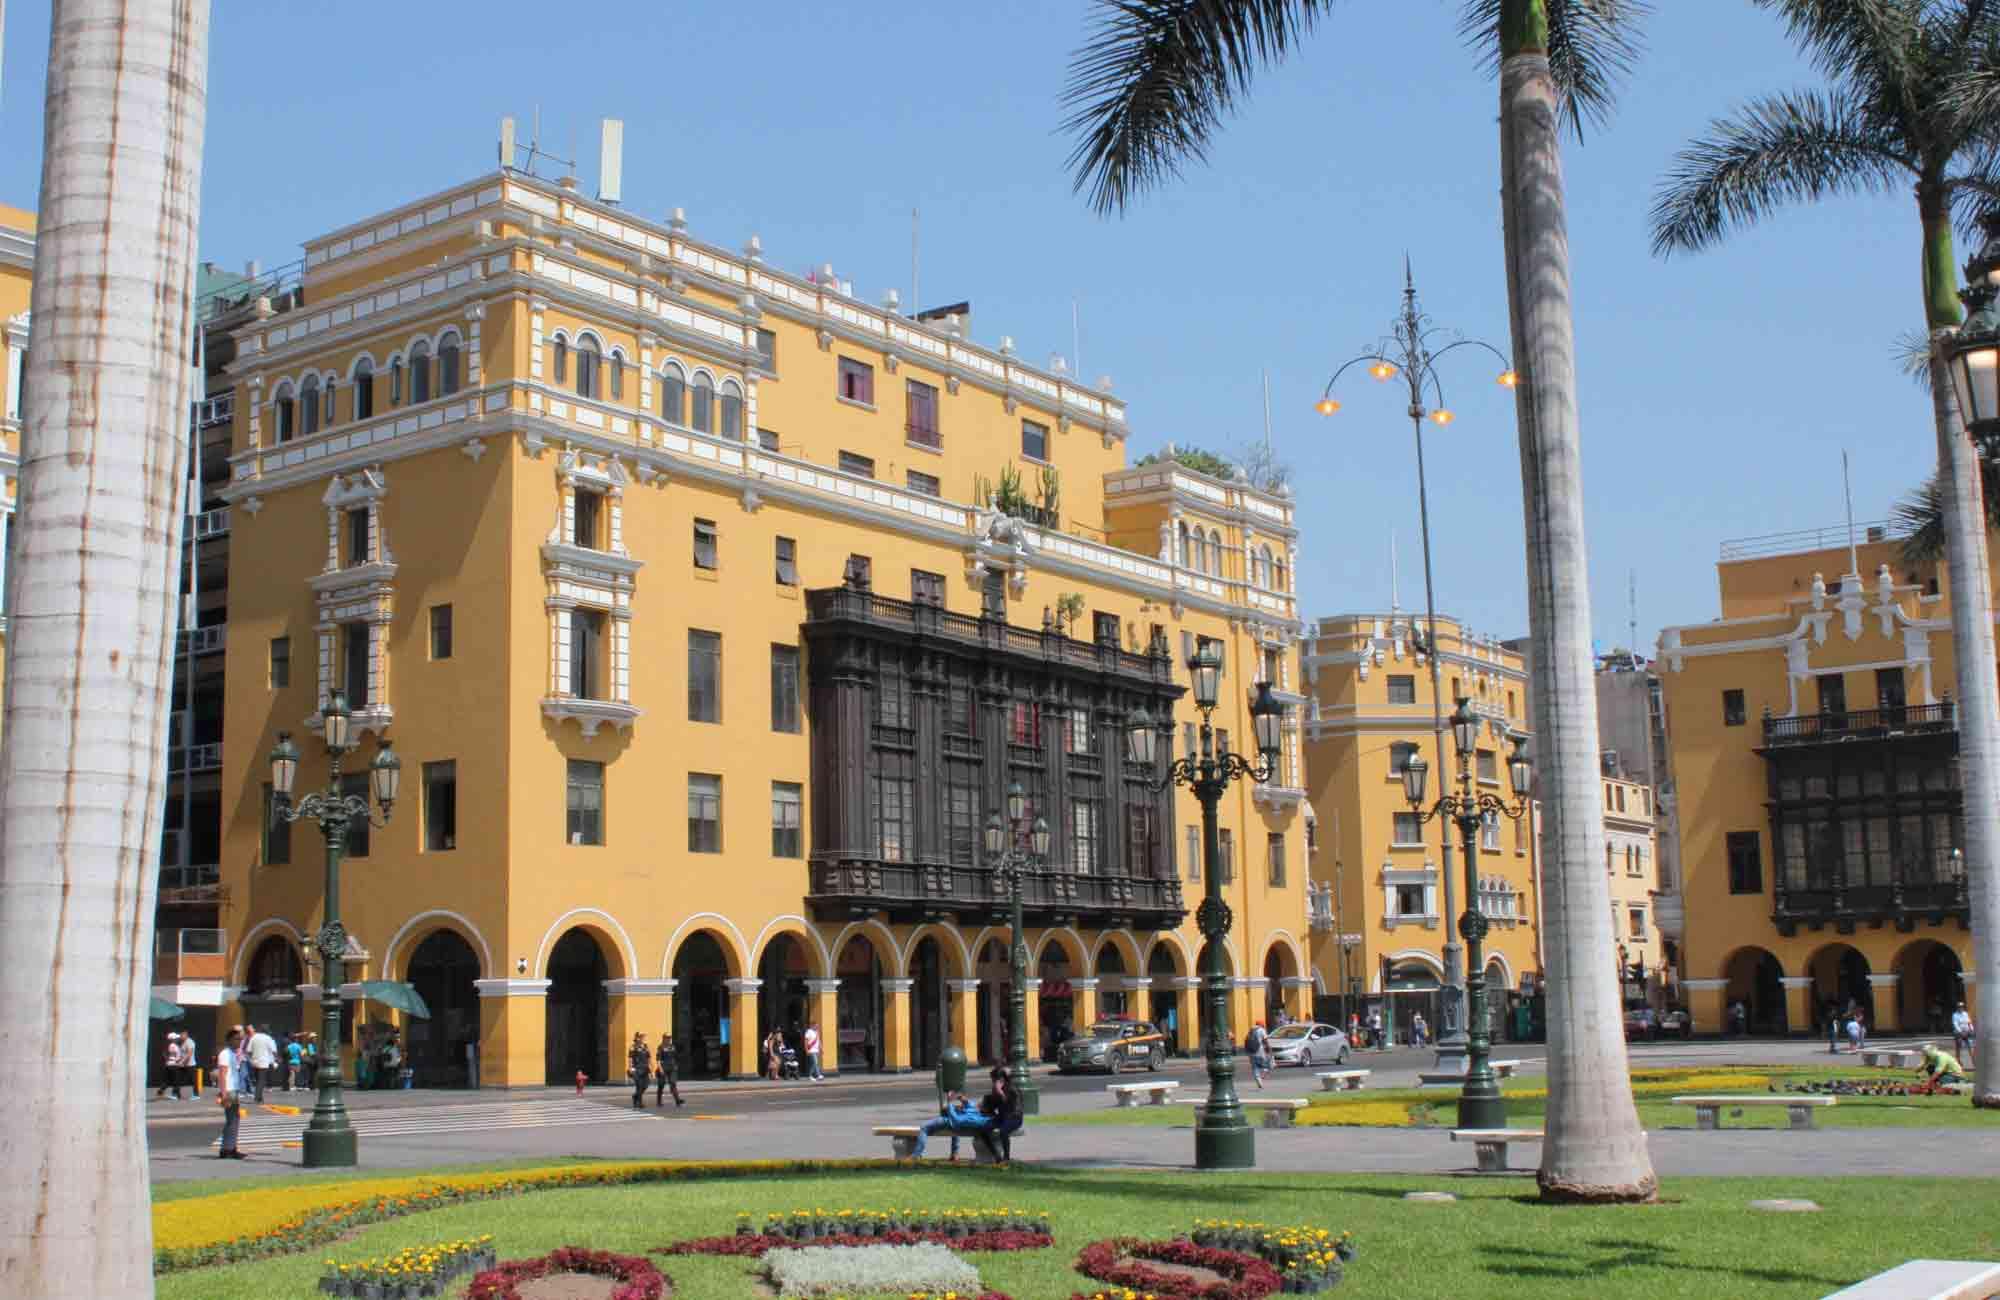 Voyage Pérou - Lima Plaza da Armas - Amplitudes